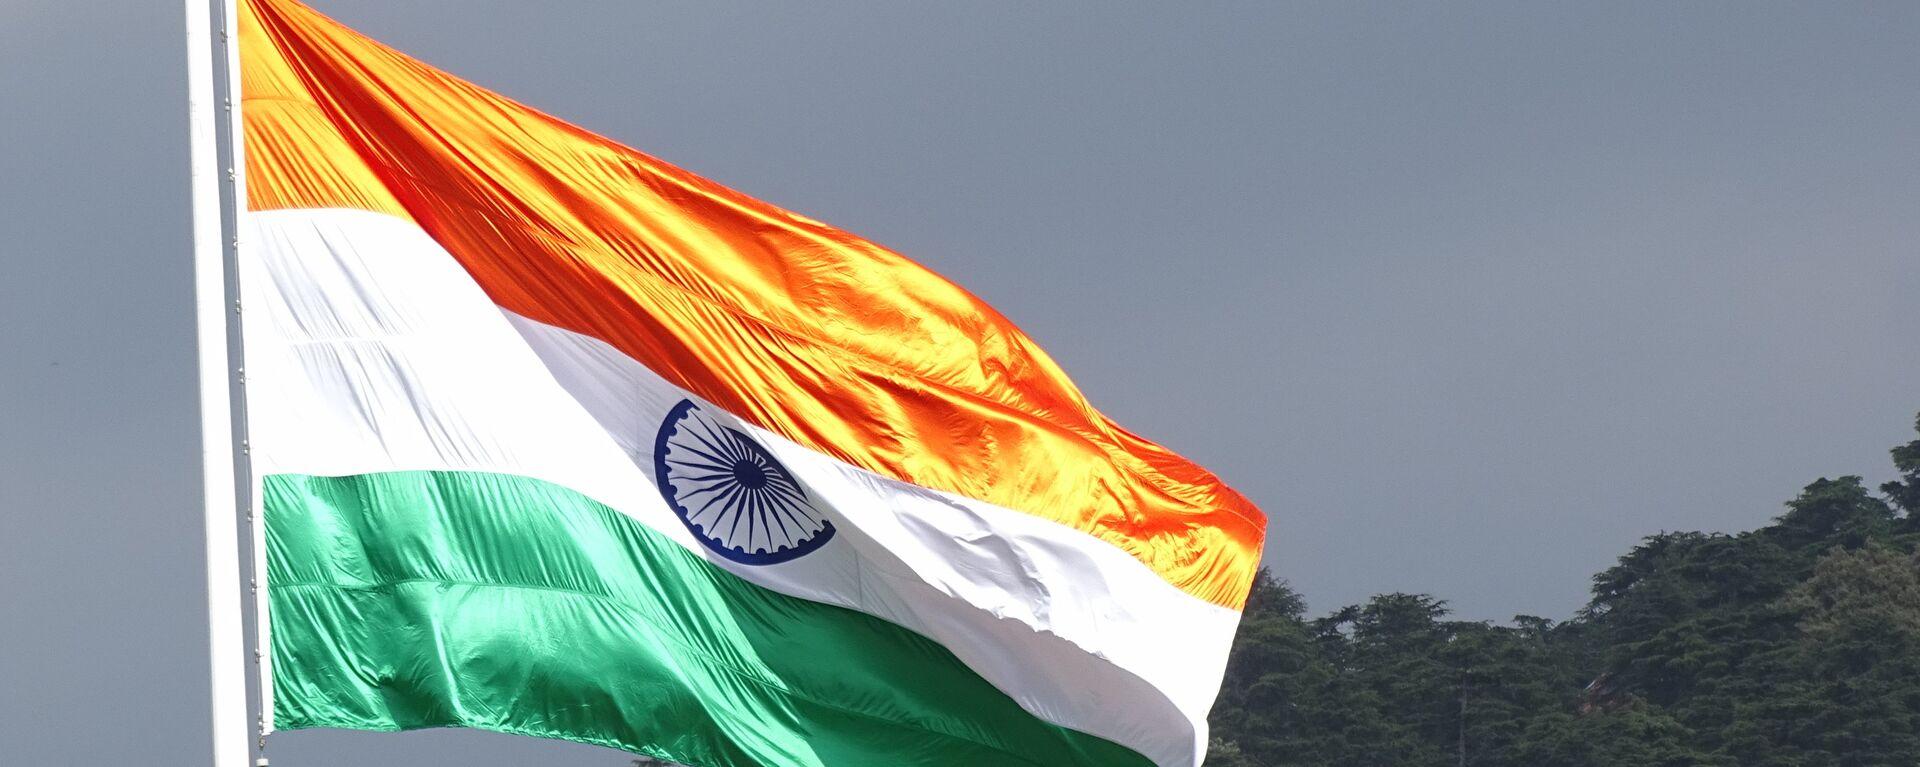 Bandiera india - Sputnik Italia, 1920, 29.05.2021